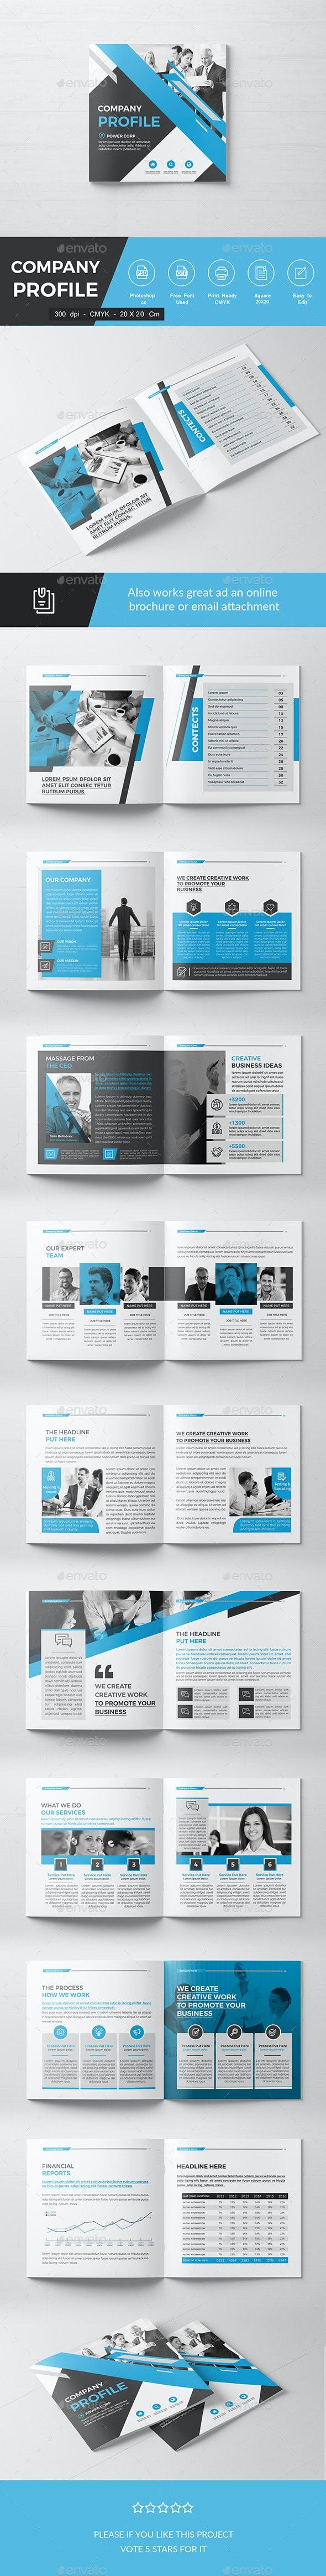 Square Company Brochure - Corporate Brochures